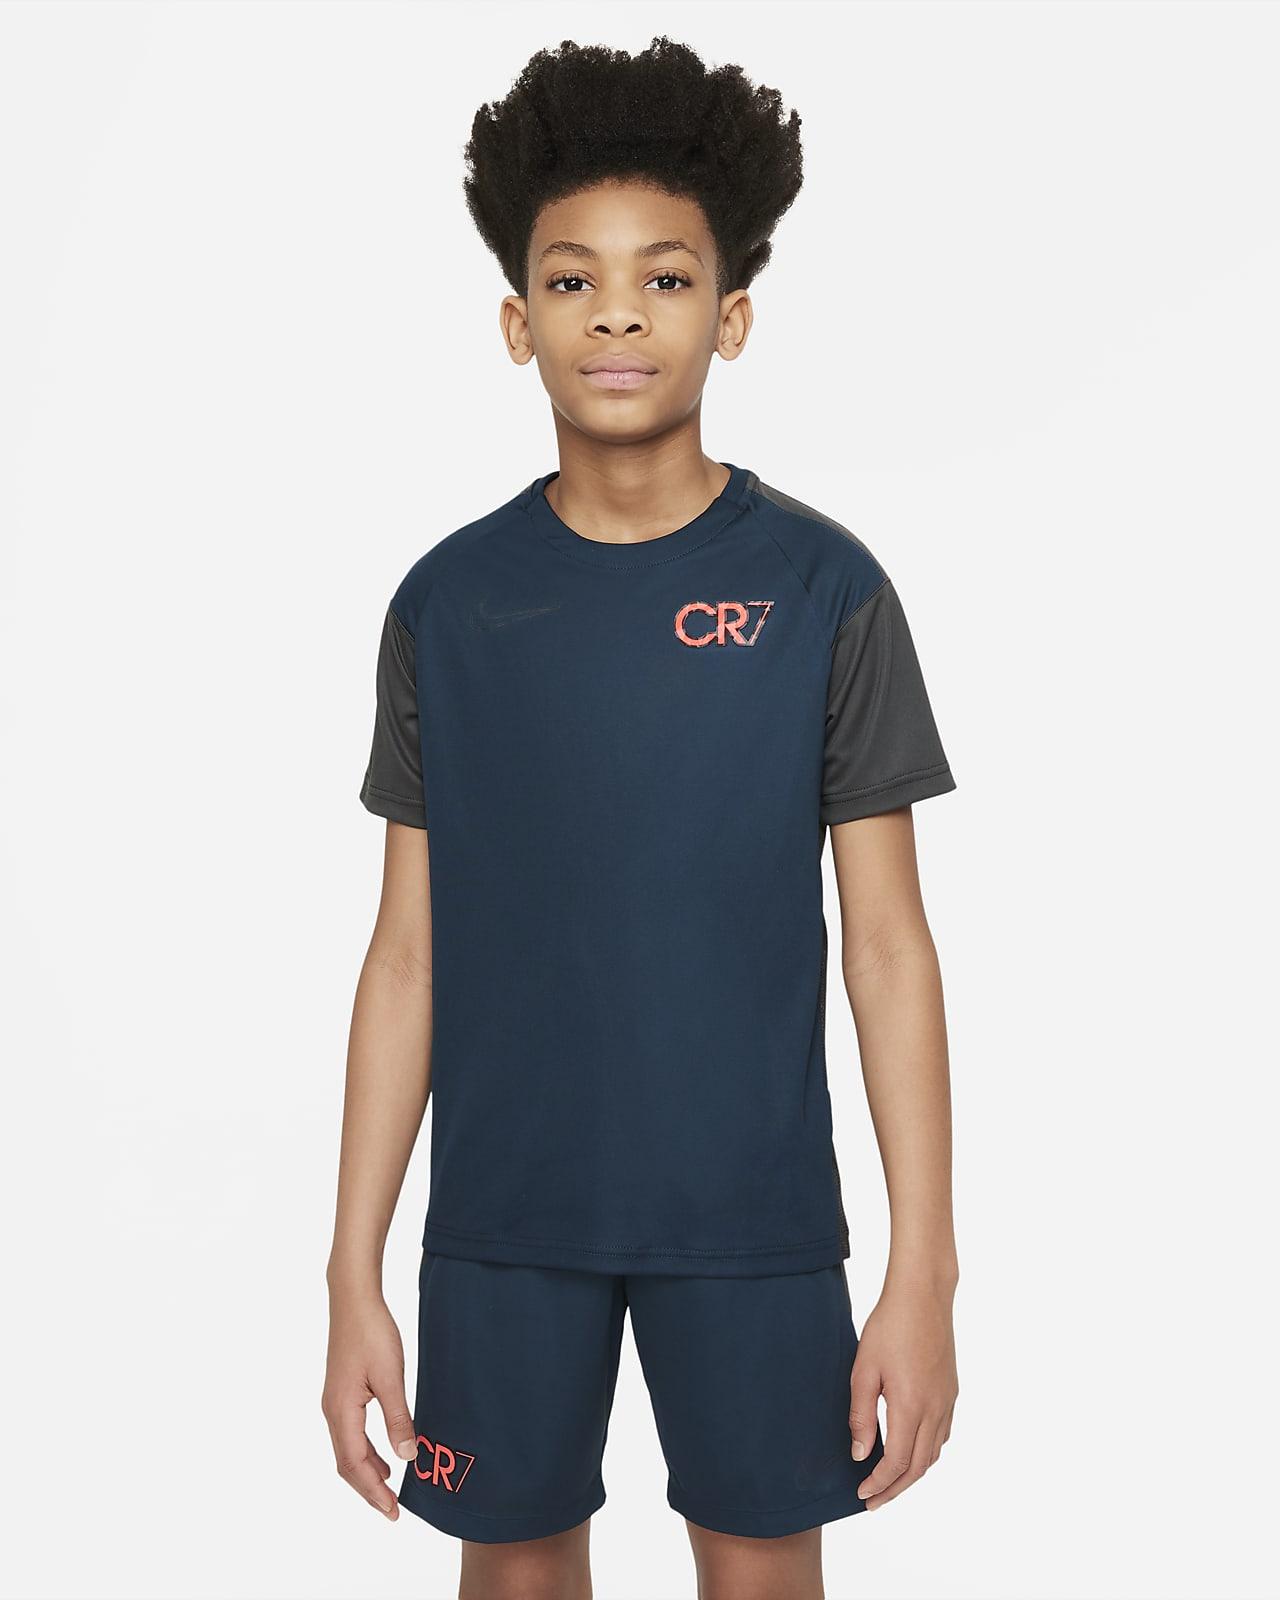 Top de fútbol de manga corta para niños talla grande Nike Dri-FIT CR7